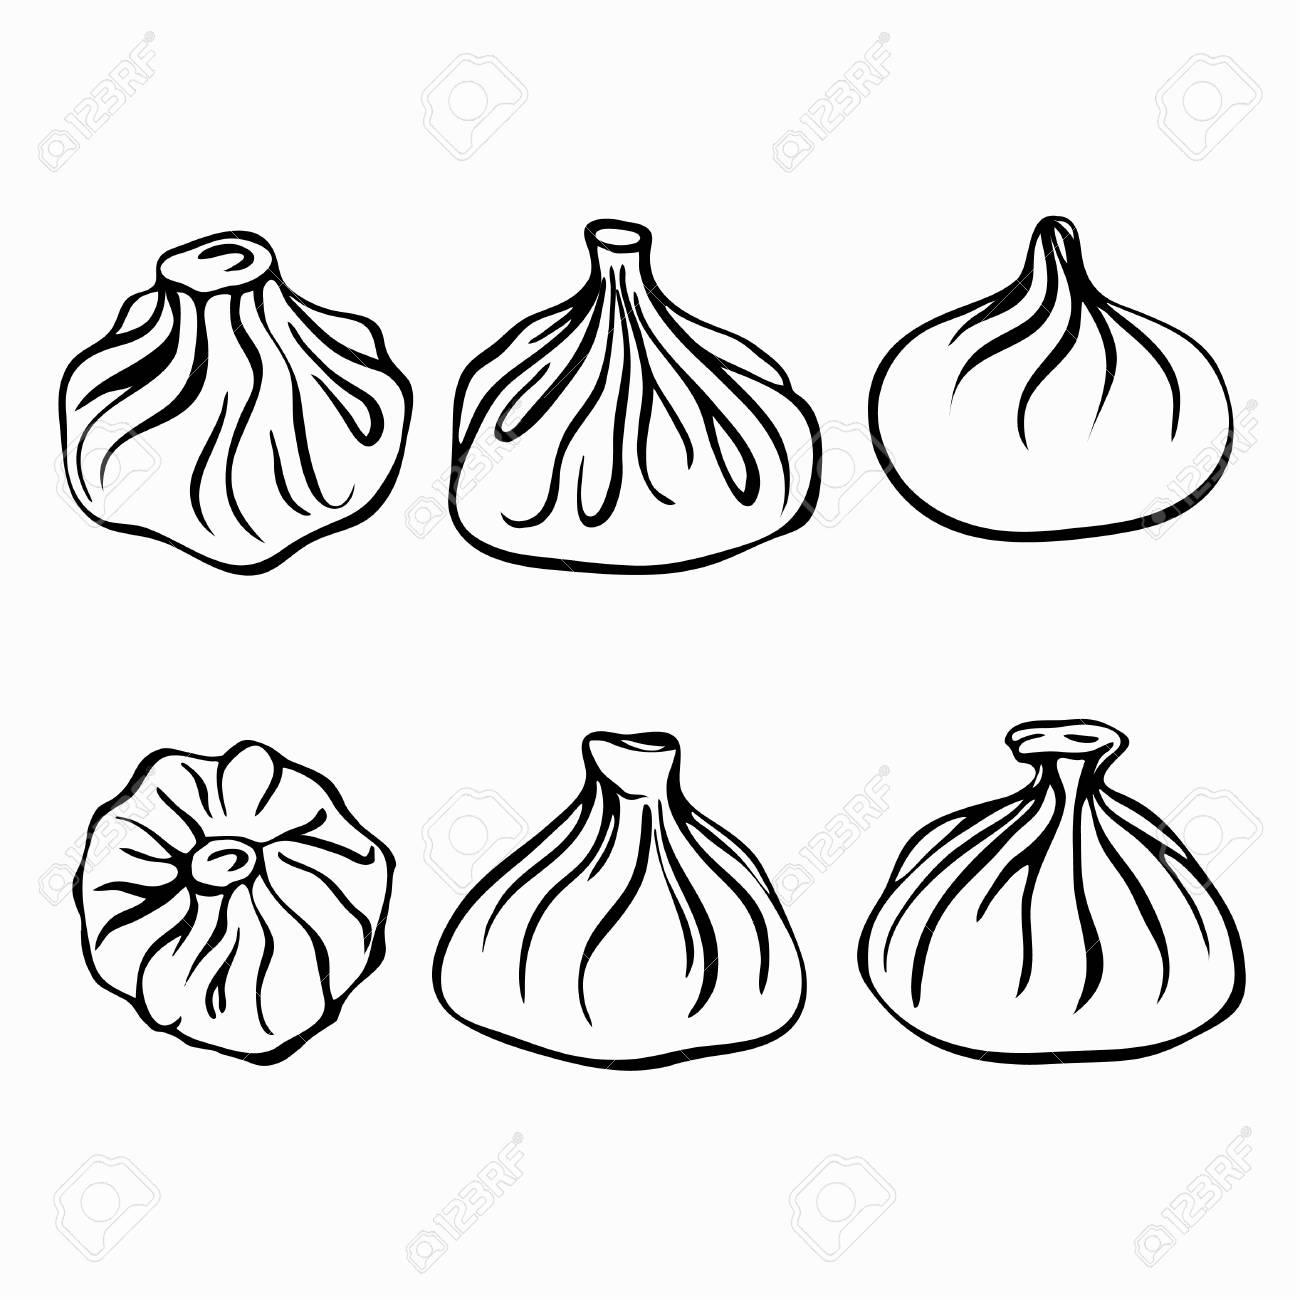 hand drawn vector sketch of khinkalis meat dumplings national  hand drawn vector sketch of khinkalis meat dumplings national traditional dish of ge ian cuisine